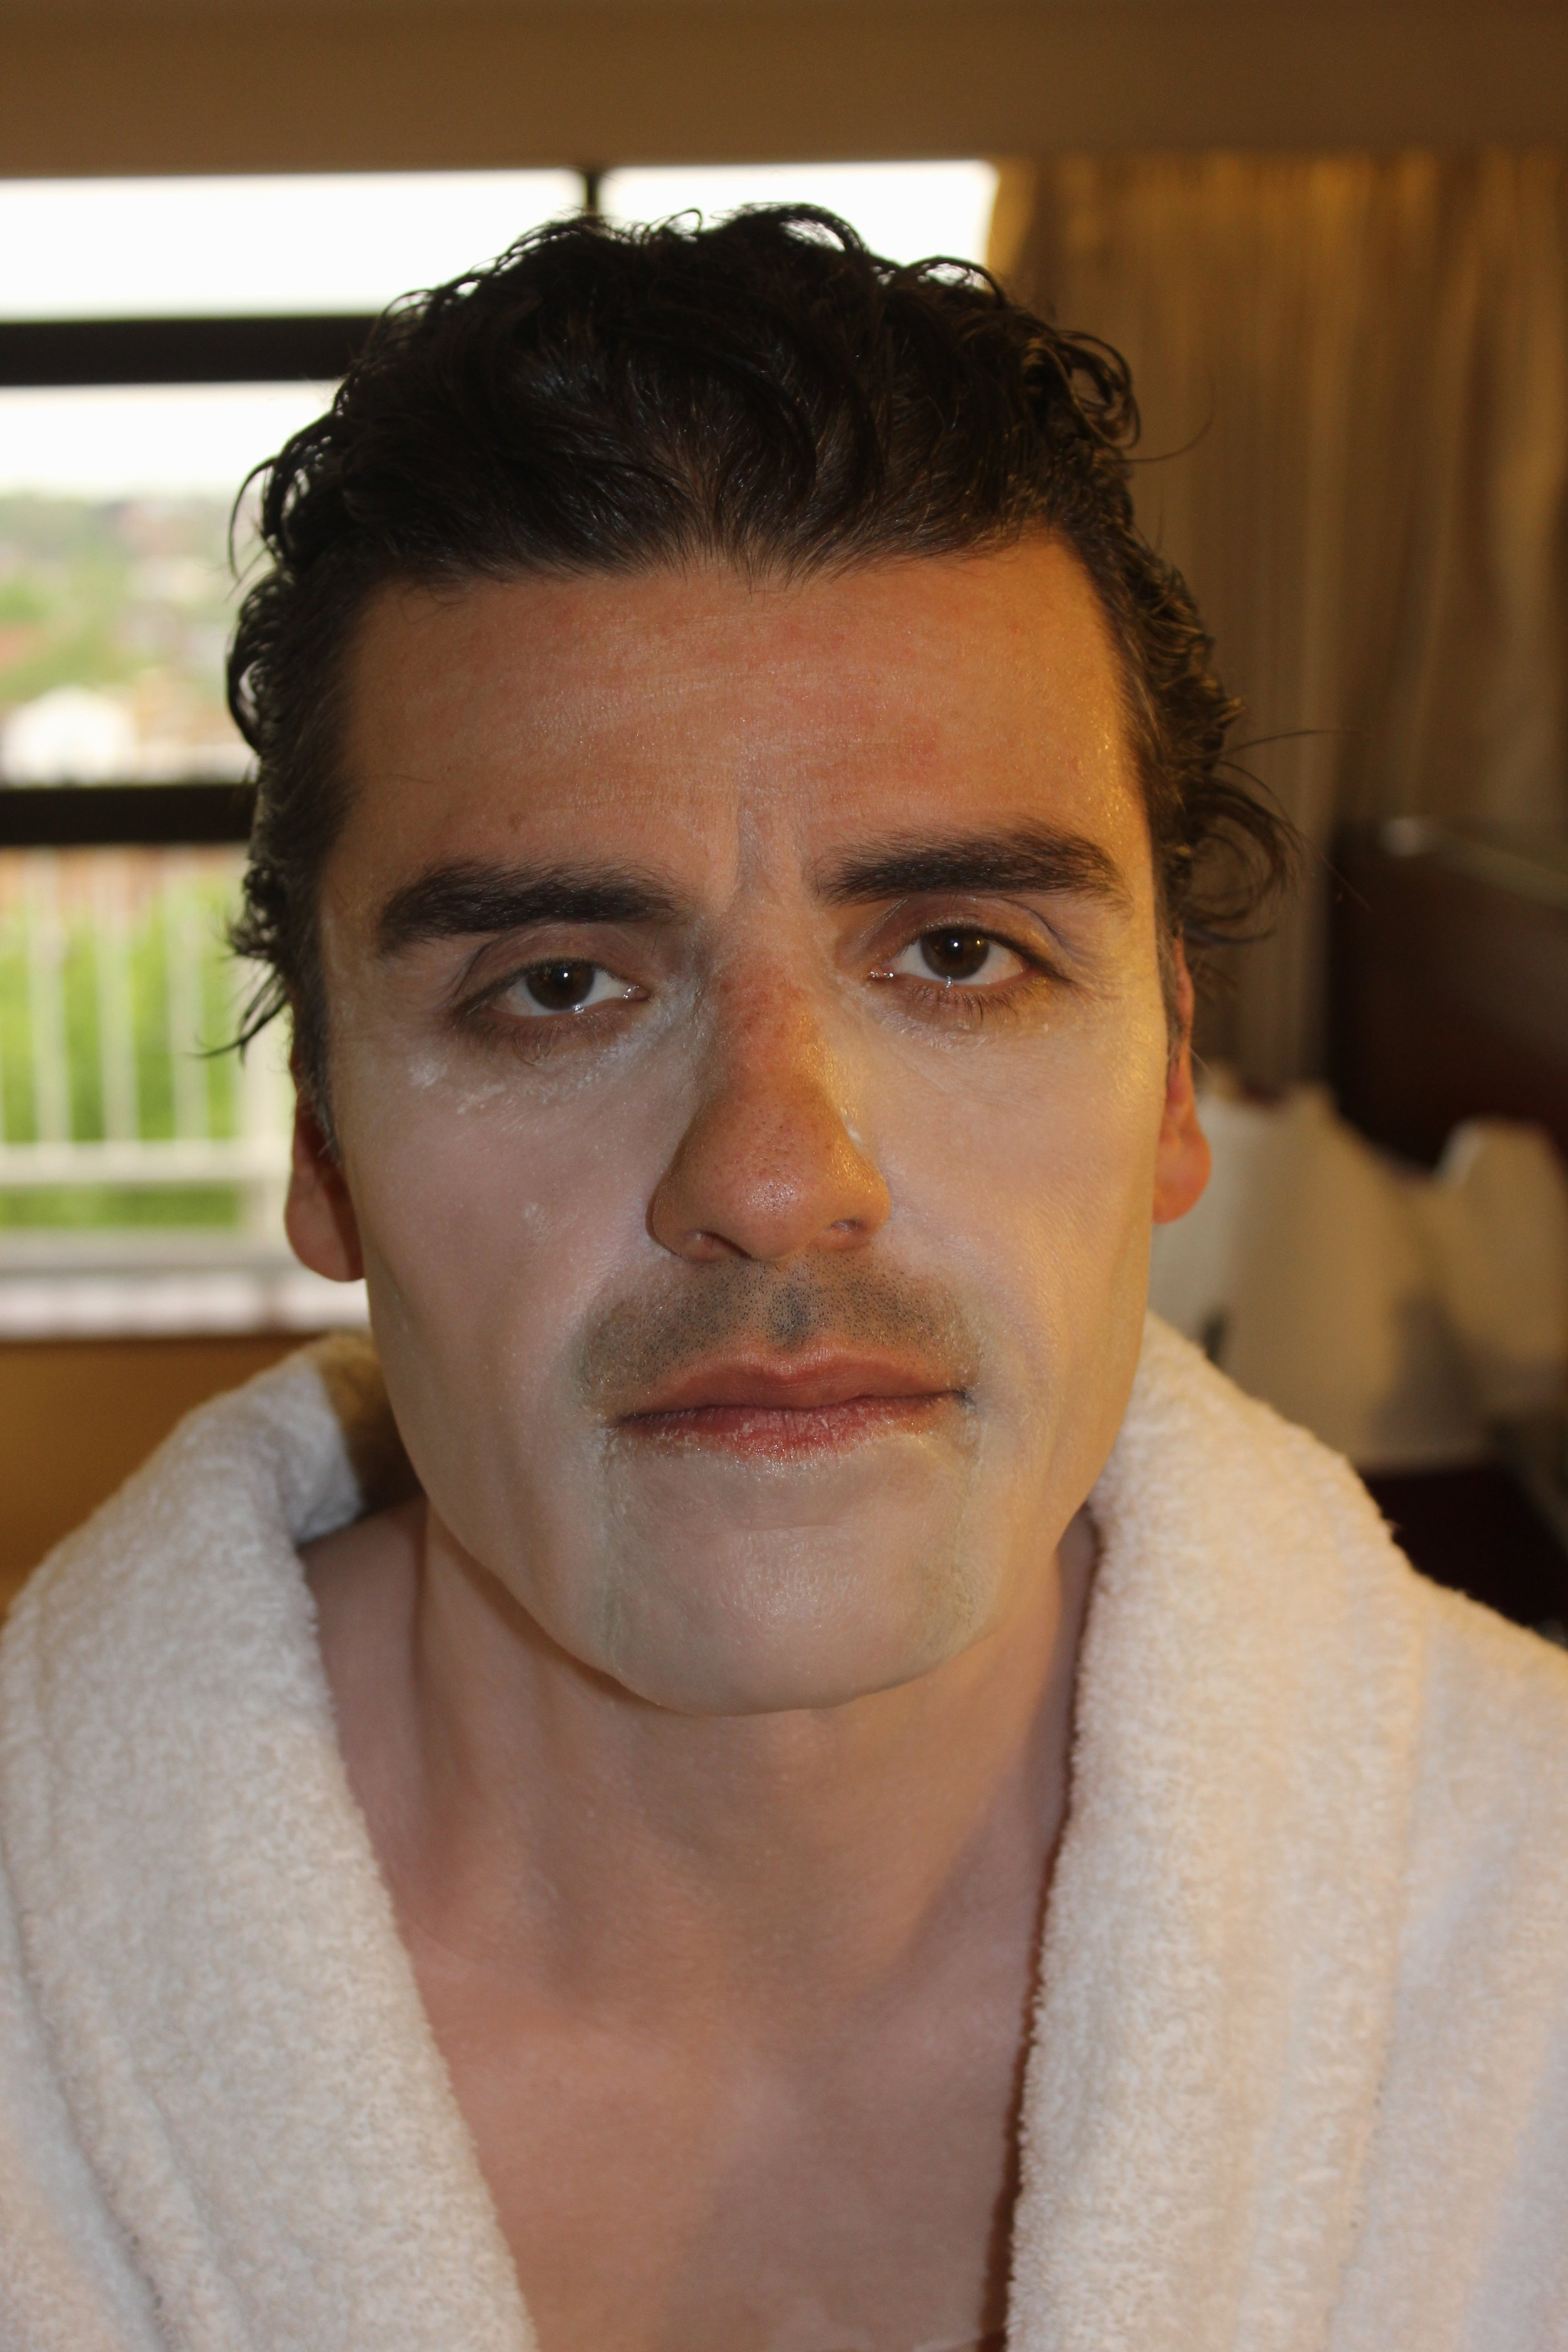 Oscar Makeup in Mid Process 03.jpg